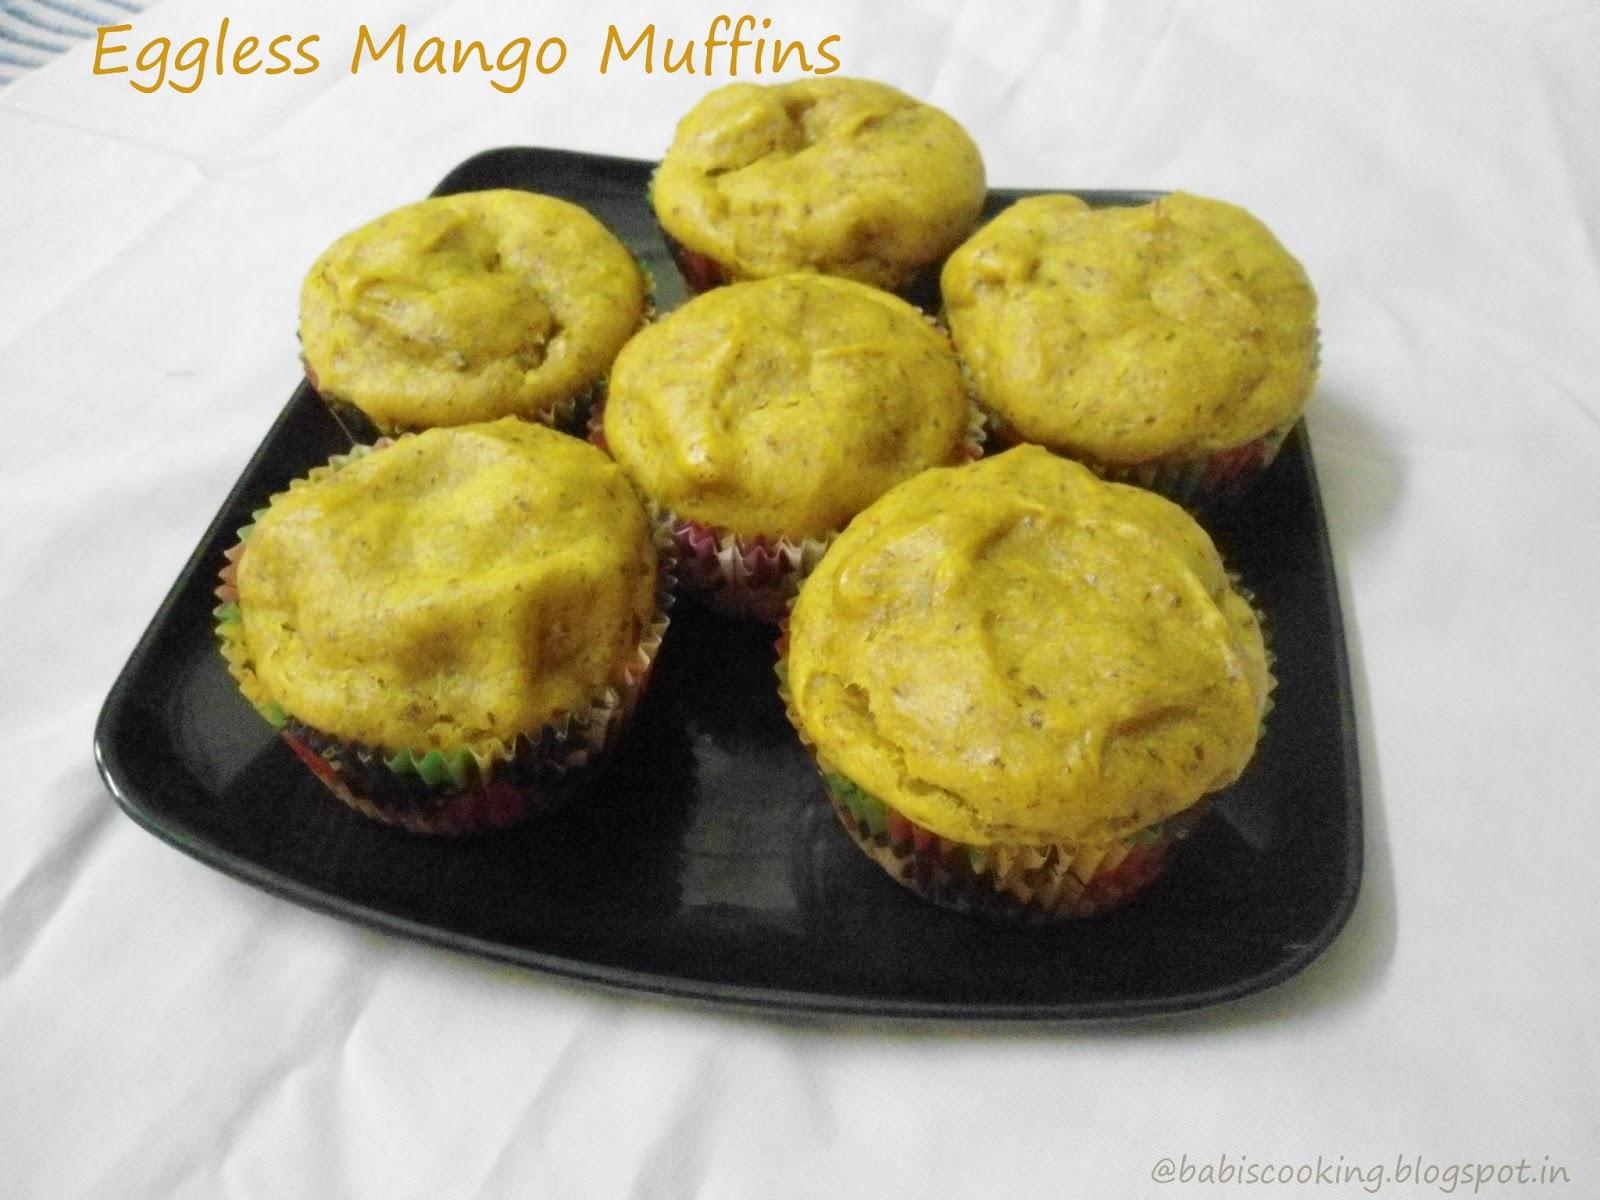 Babi 's Recipes: Eggless Mango Muffins